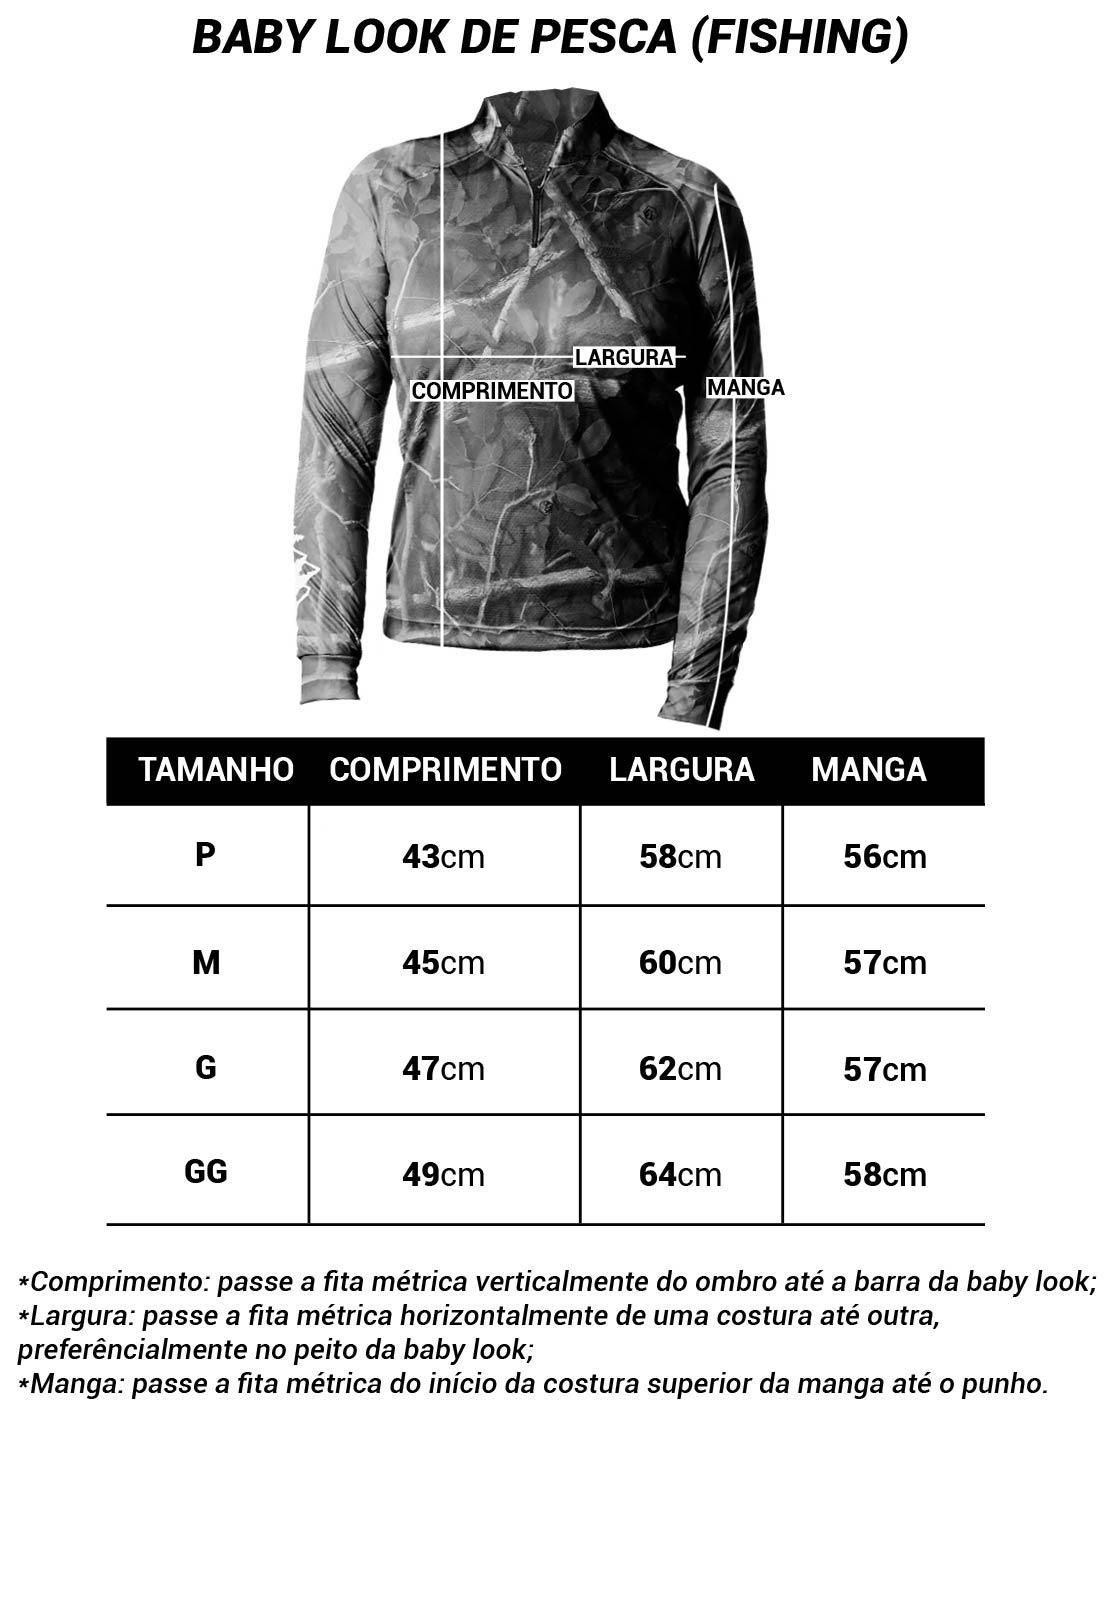 CAMISA DE PESCA FISH TECH PRO 05 FEMININA + BANDANA GRÁTIS  - REAL HUNTER OUTDOORS